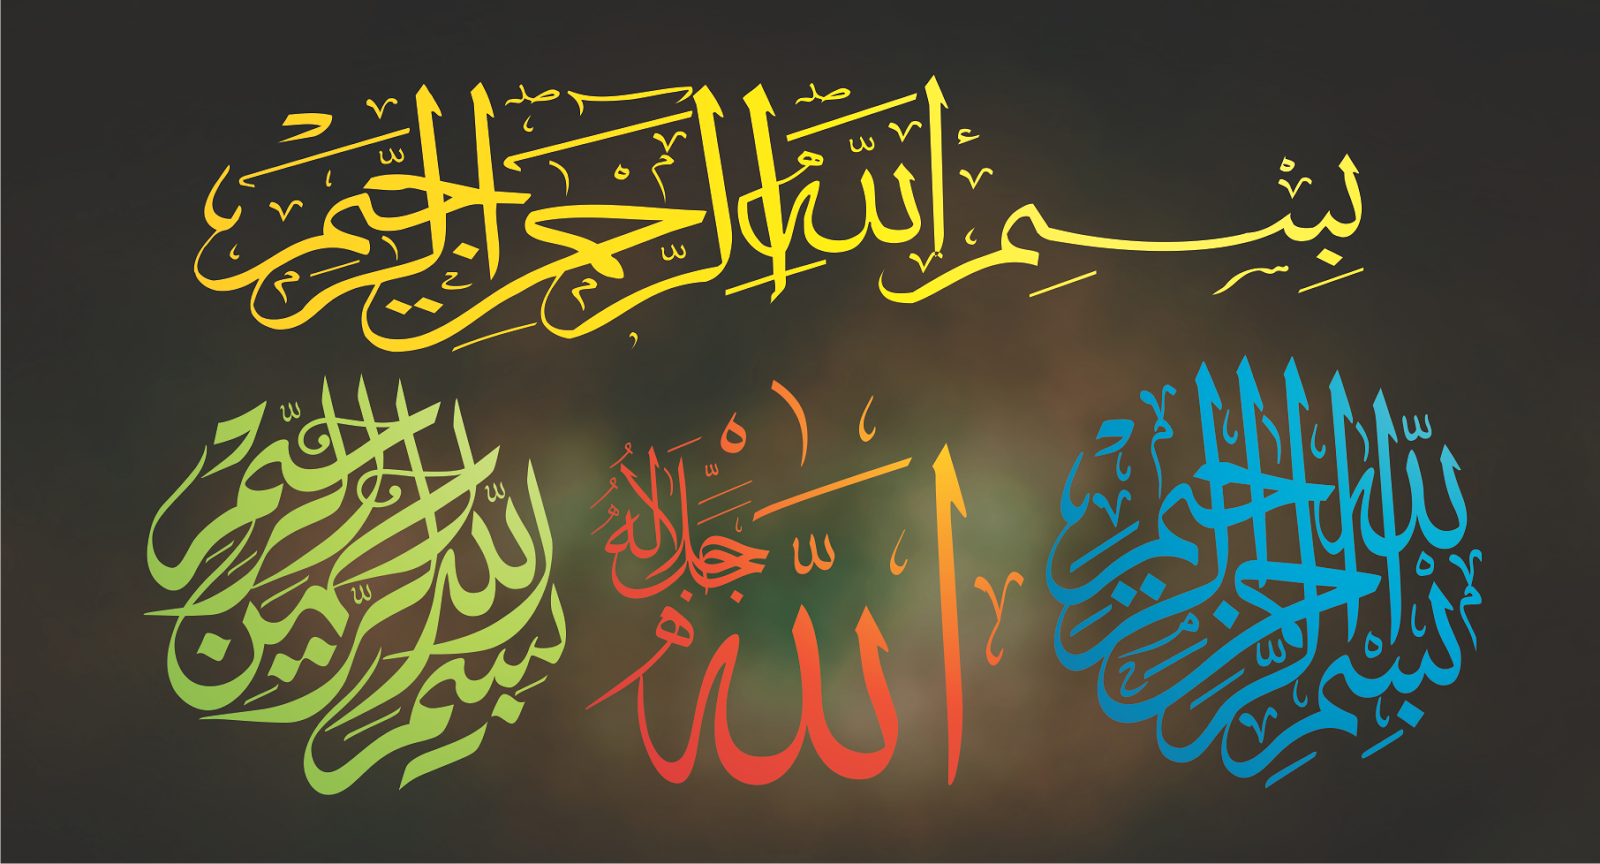 1600 x 864 · 1020 kB · png, Undangan Muslim Cdr